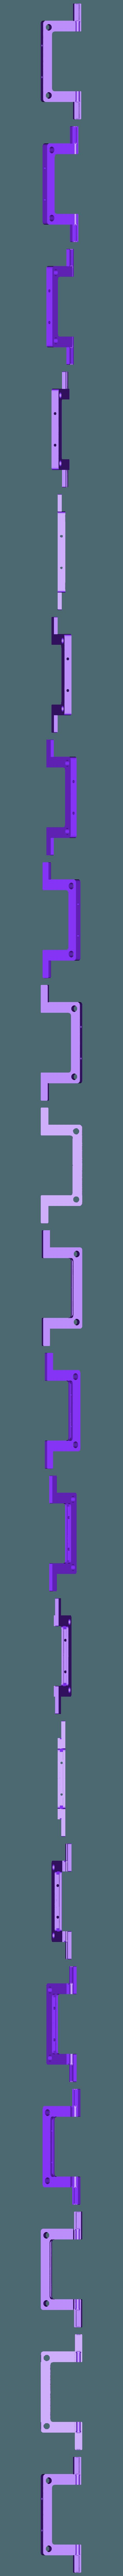 infragate.STL Download free STL file [logger] • Model to 3D print, simiboy